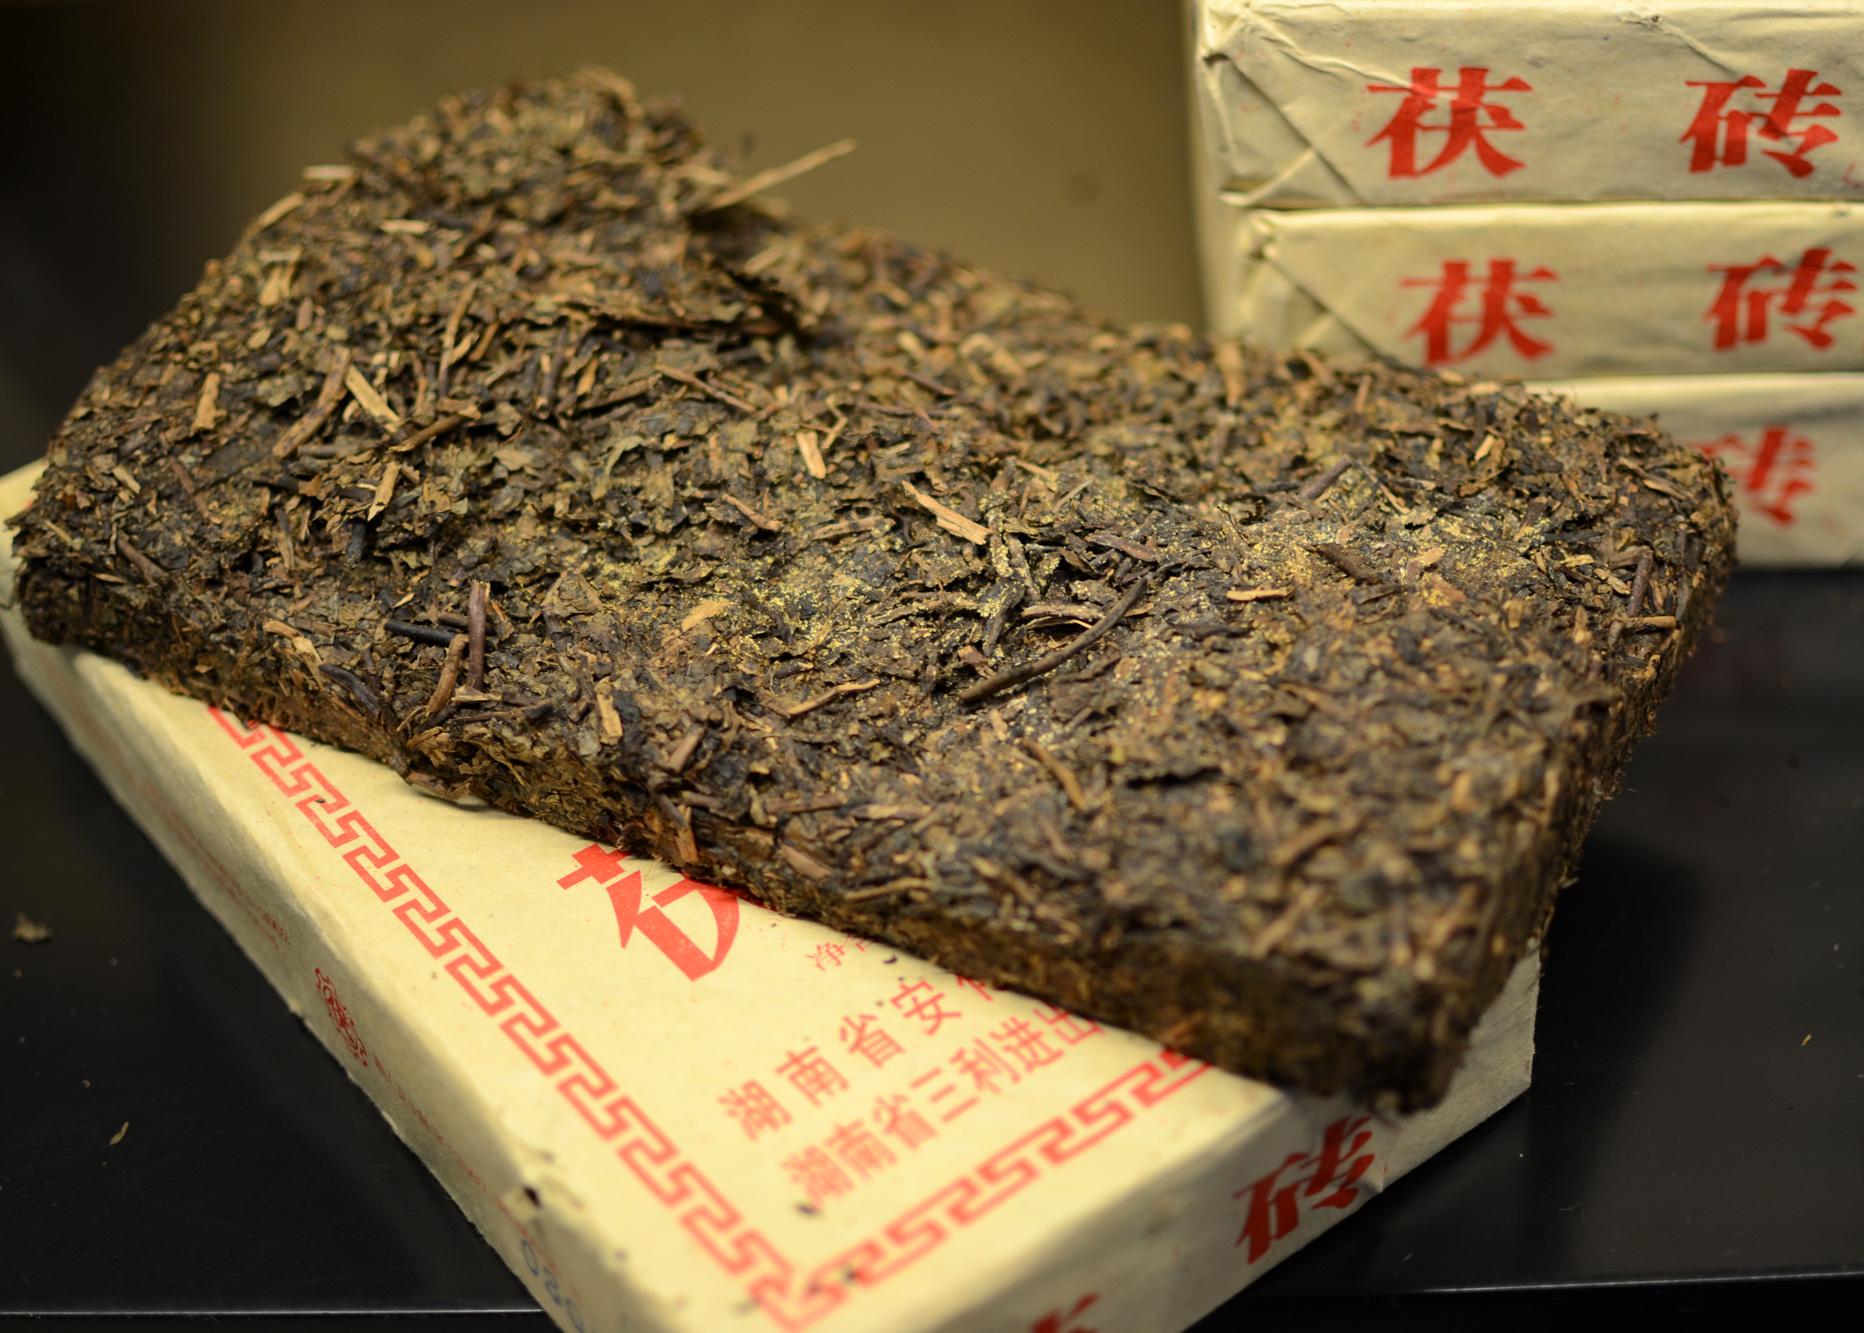 Brick of the heicha